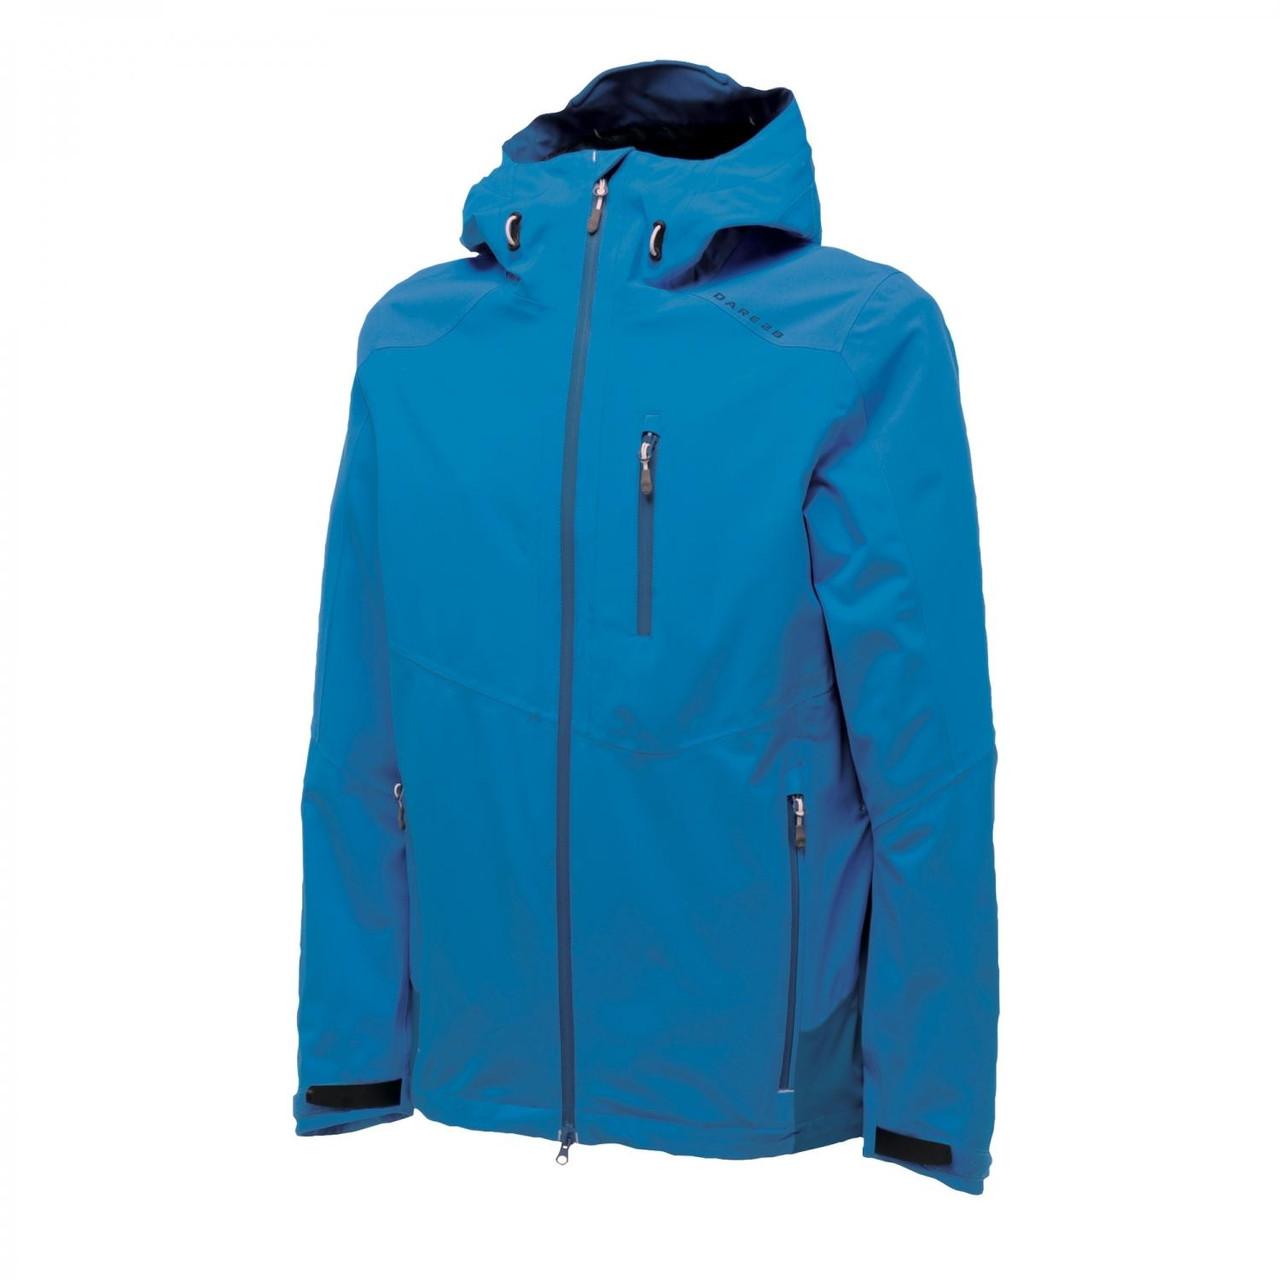 Куртка - ветровка мужская Dare2B TRAMMEL JACKET - METHYL BLUE даре2б